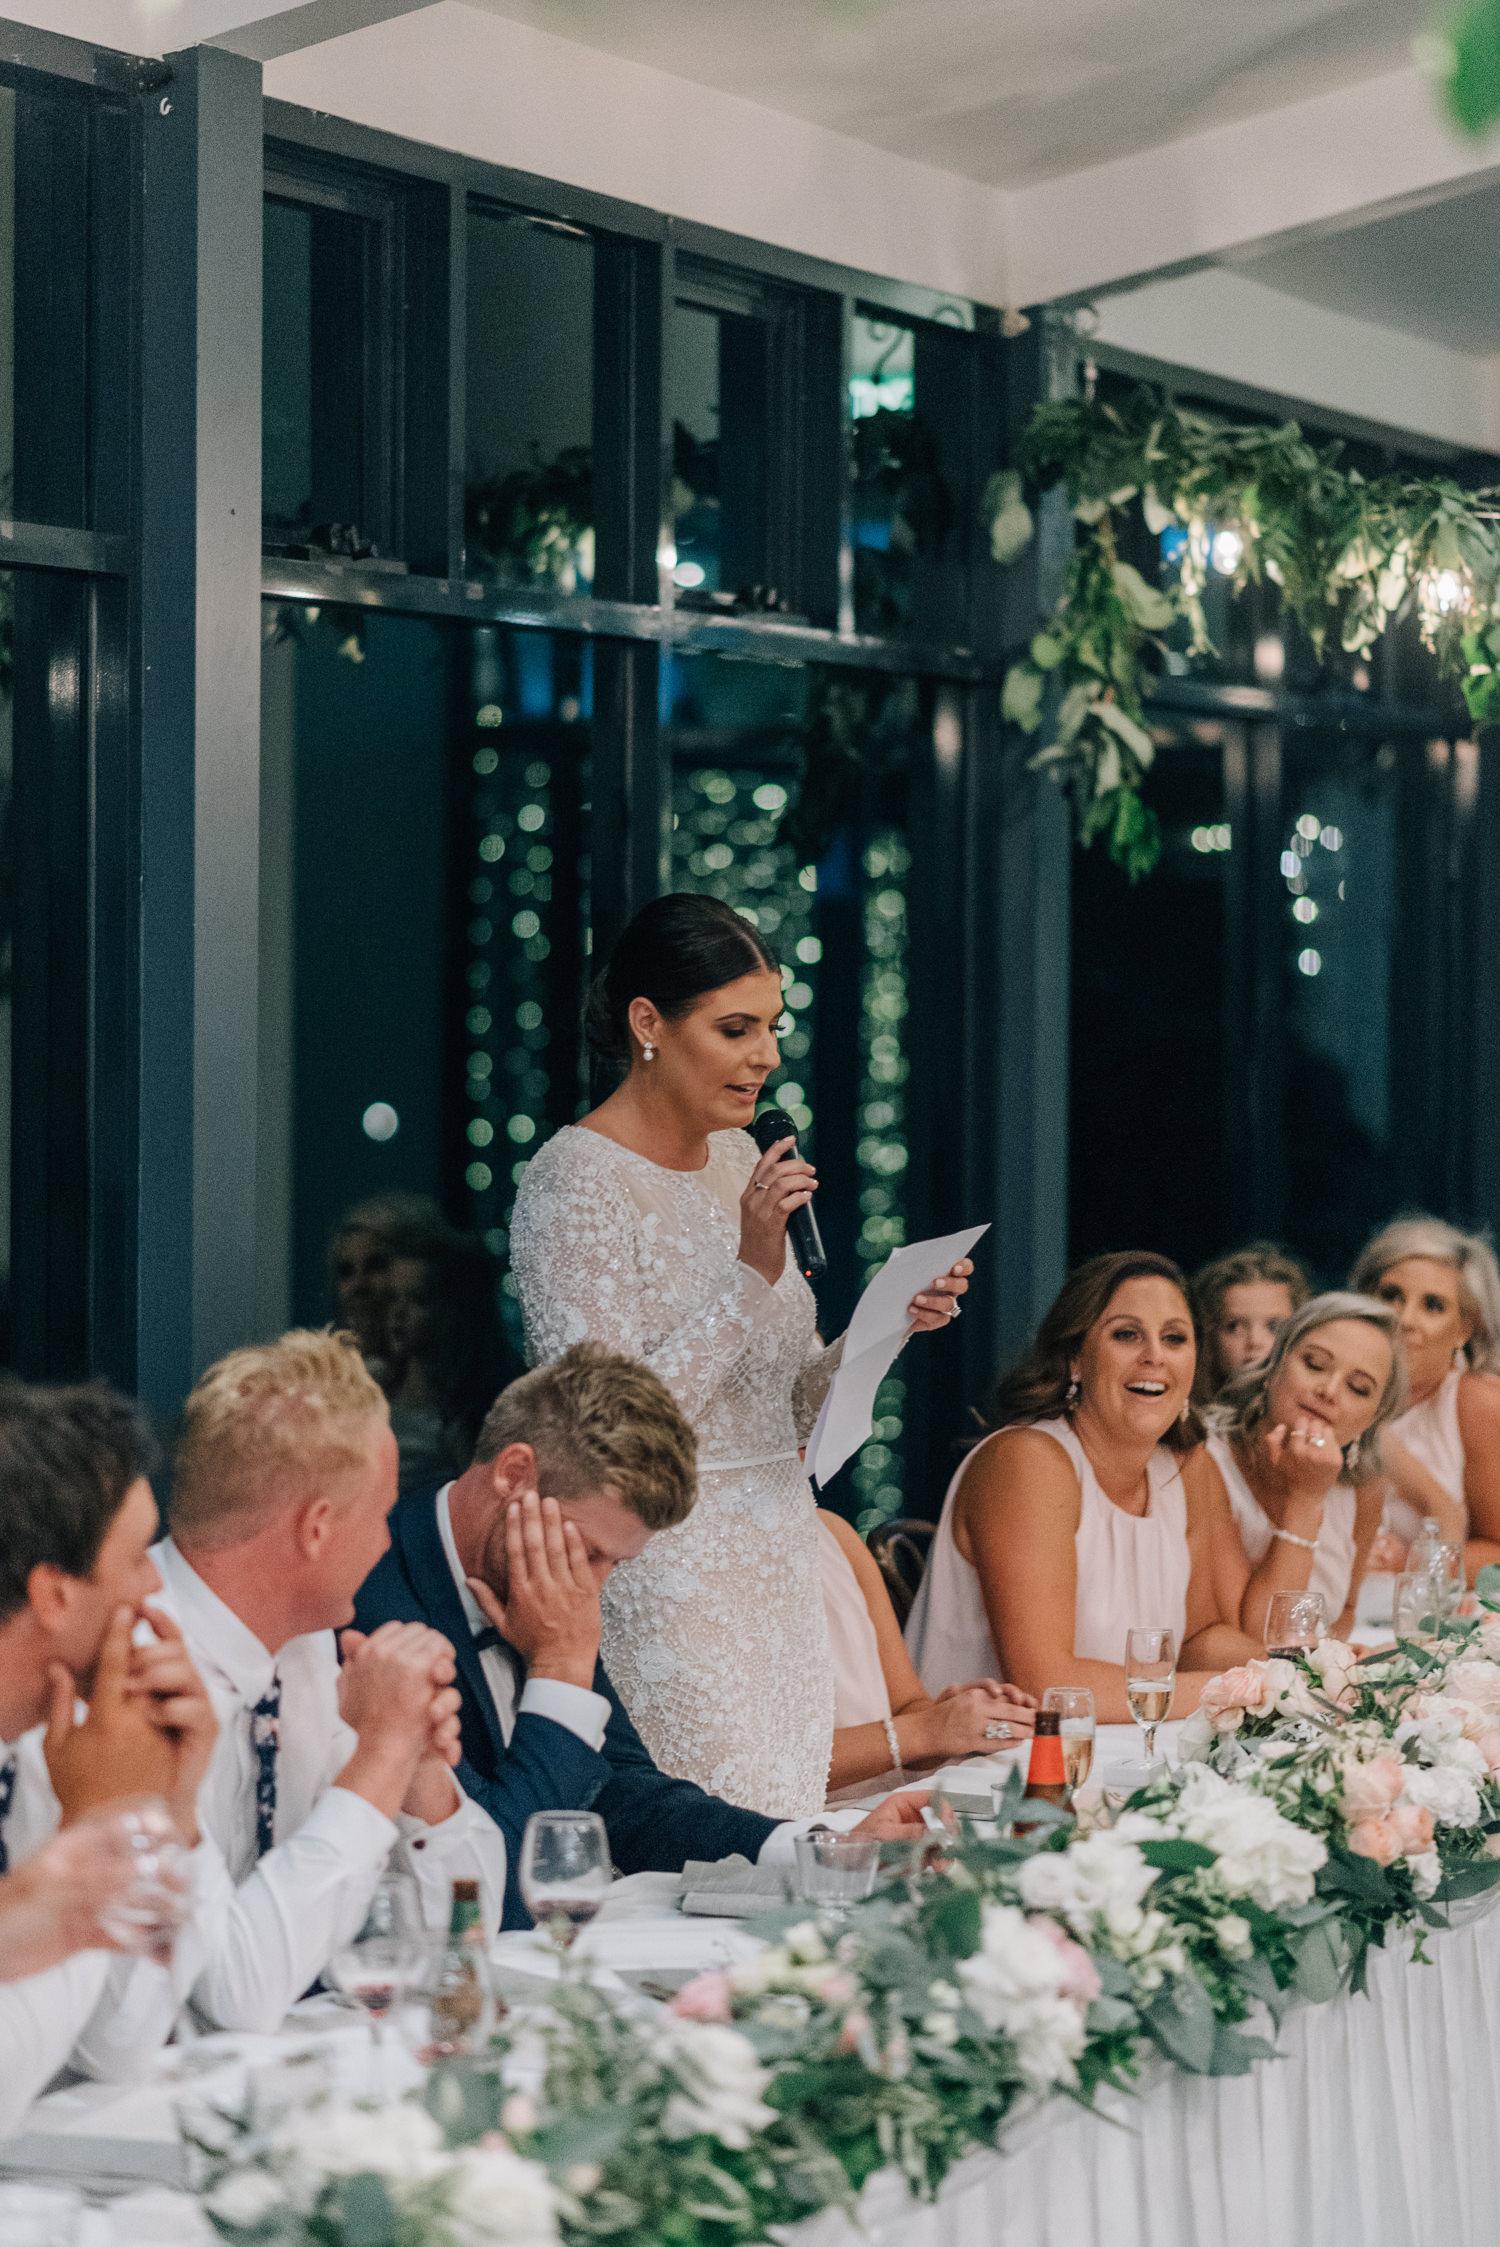 Quamby-Wedding-Photography-159.jpg